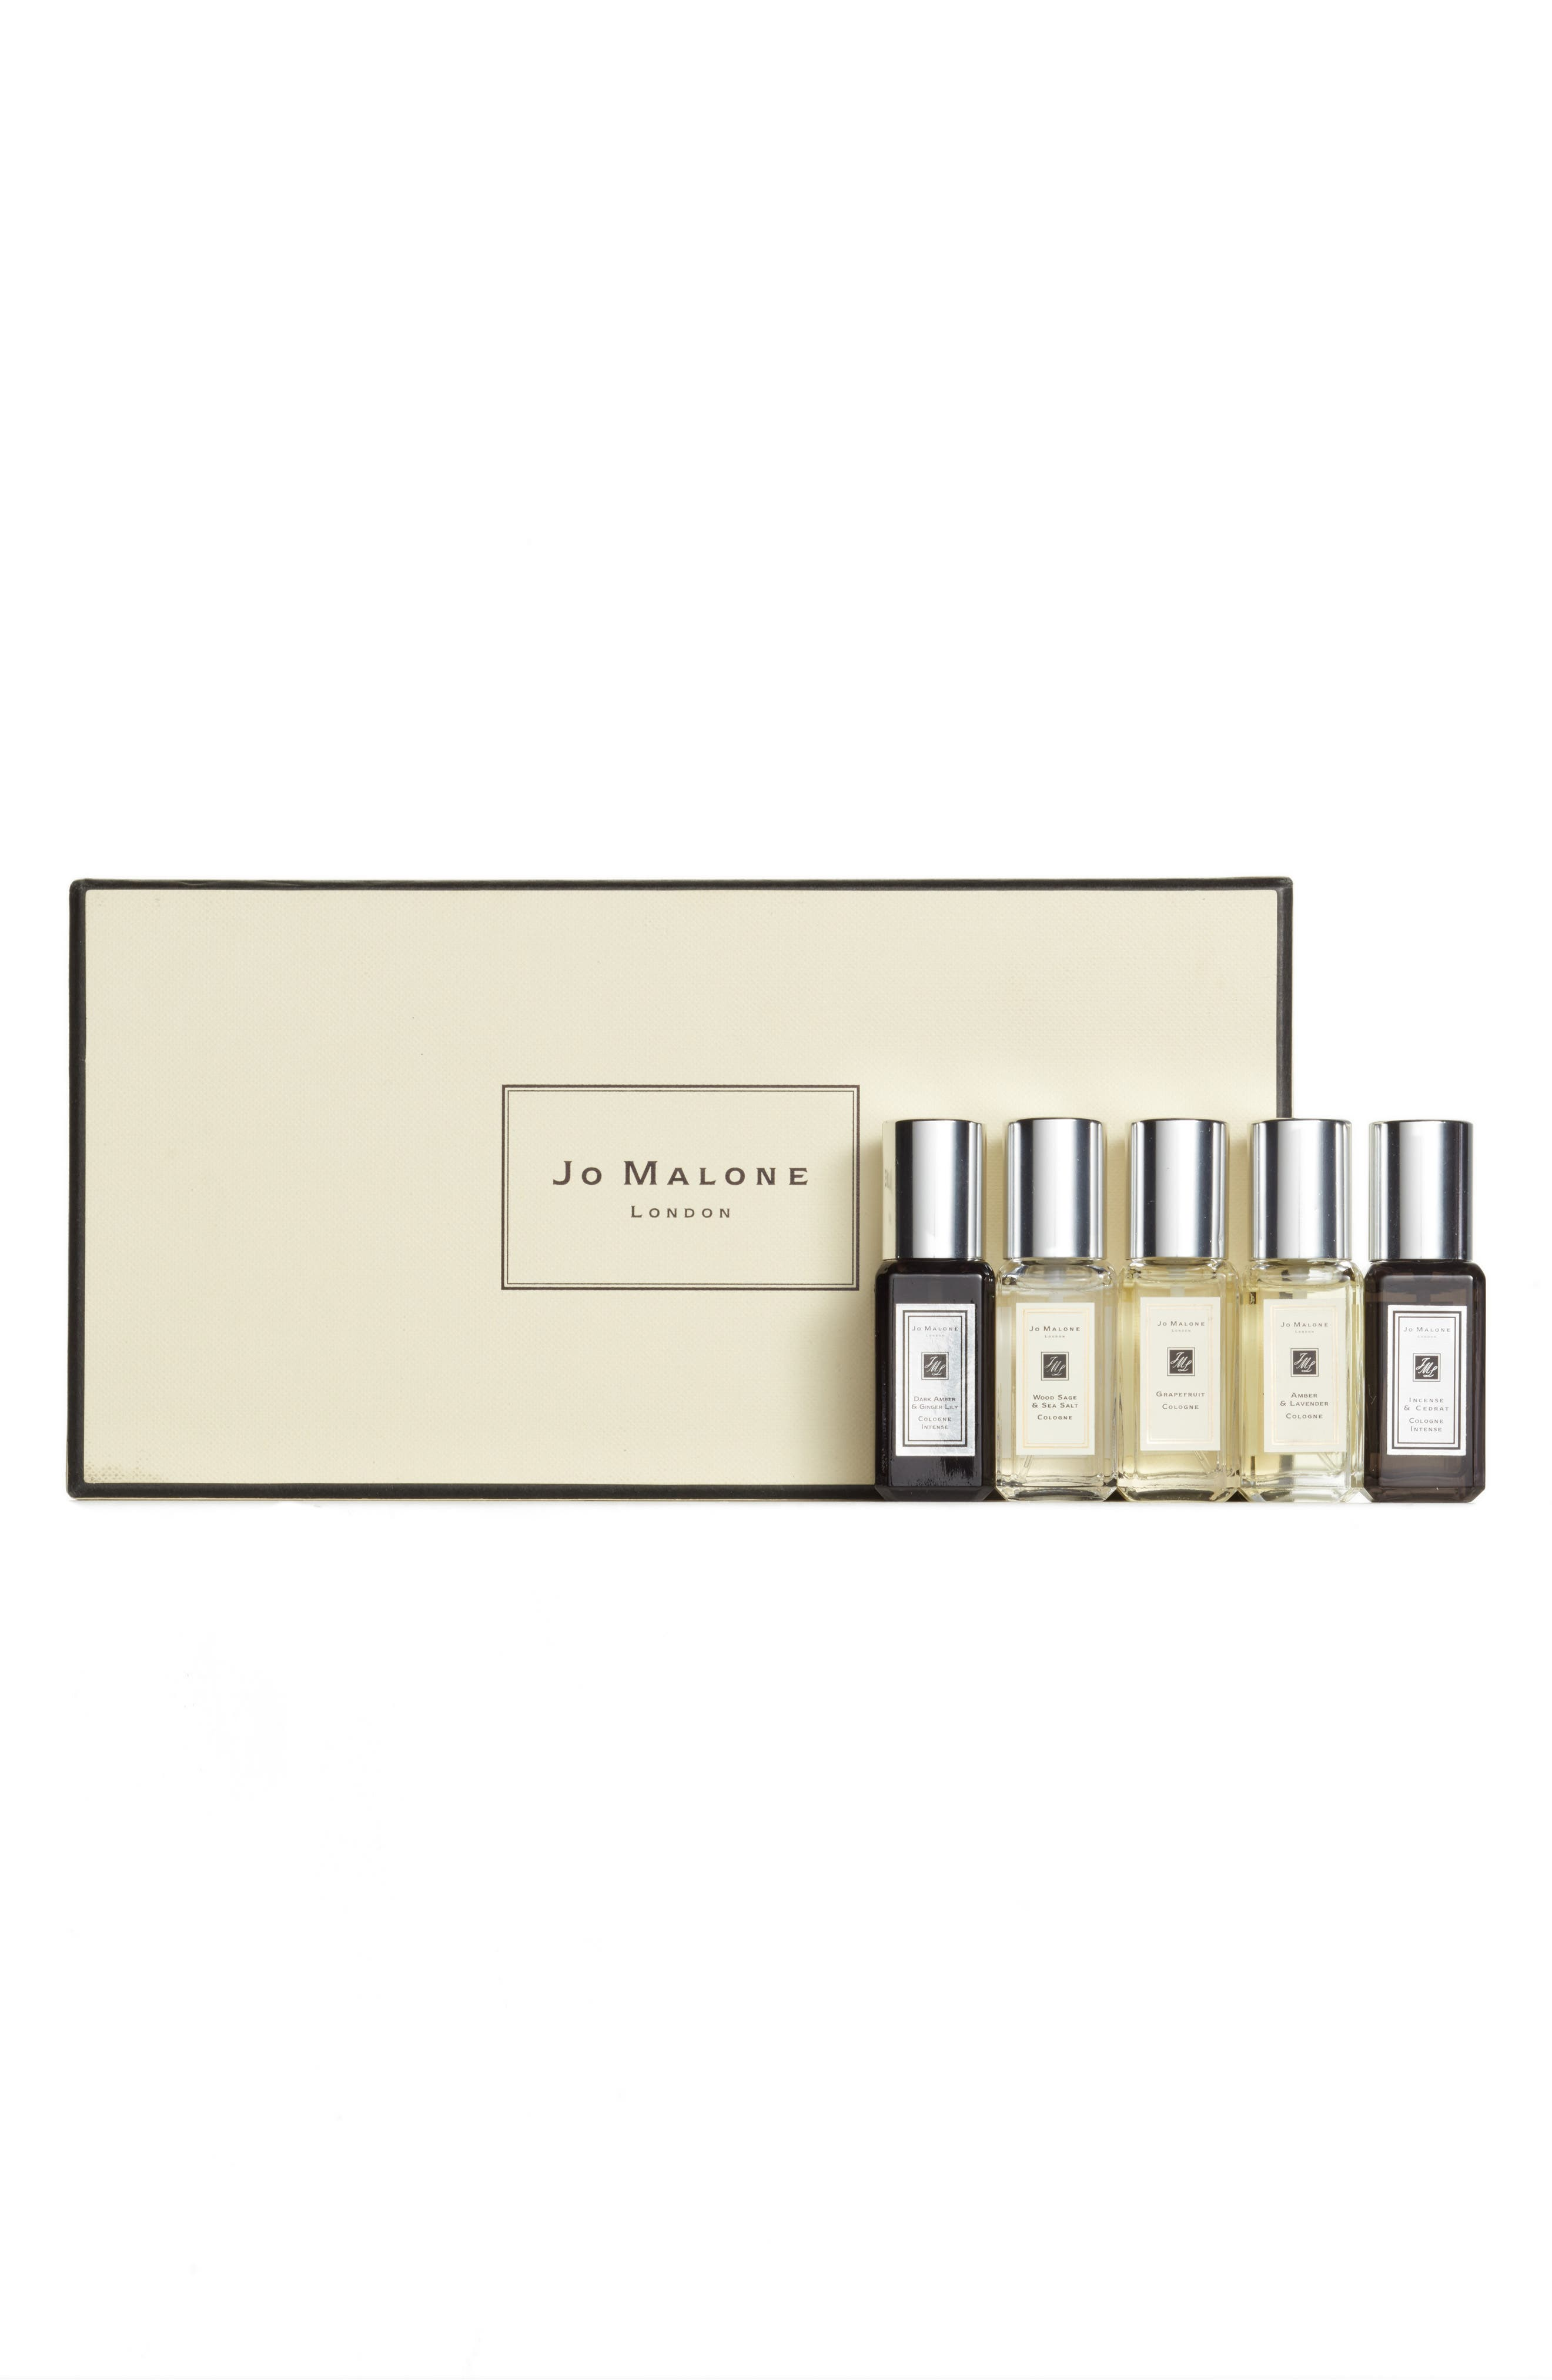 Jo Malone London Men's Cologne Collection